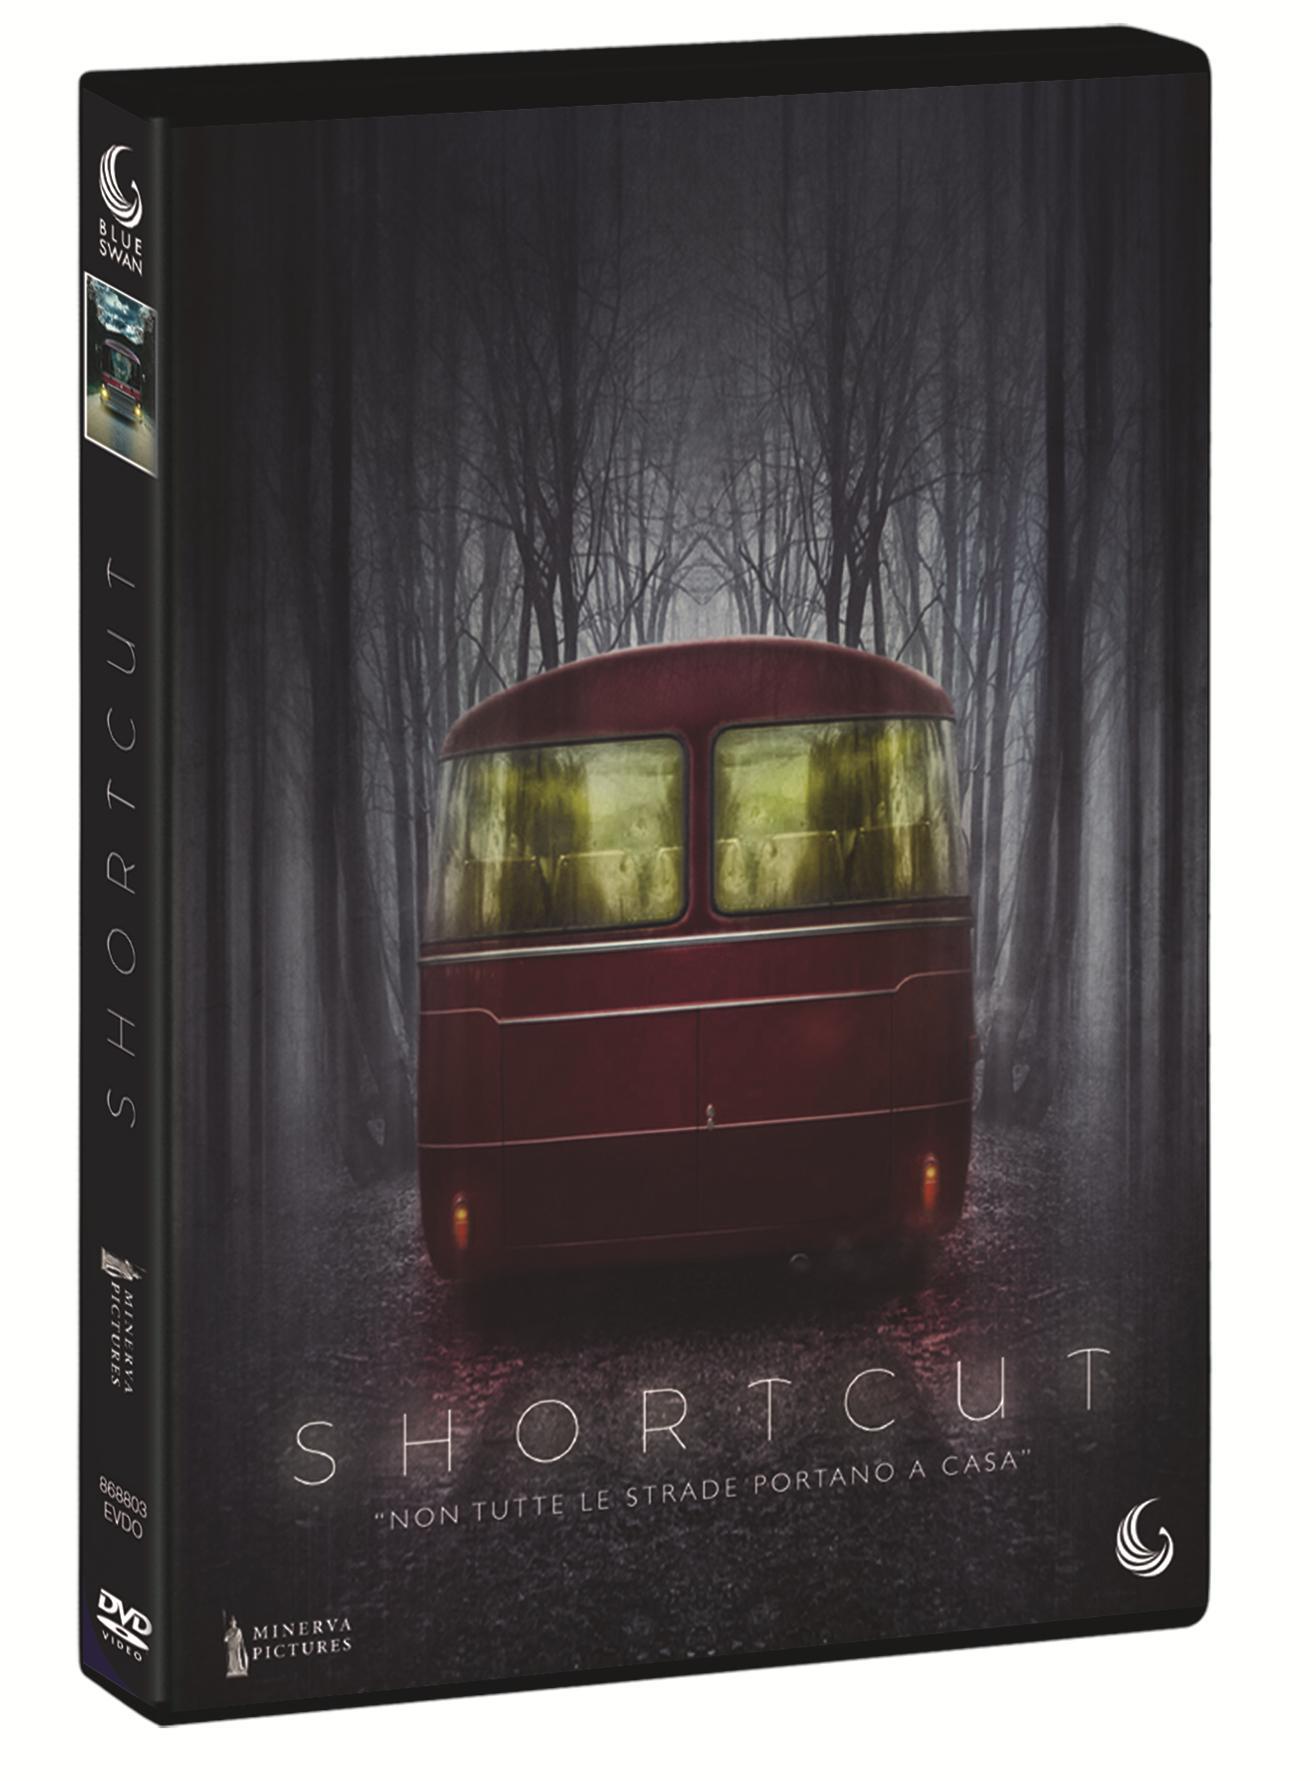 SHORTCUT (DVD)